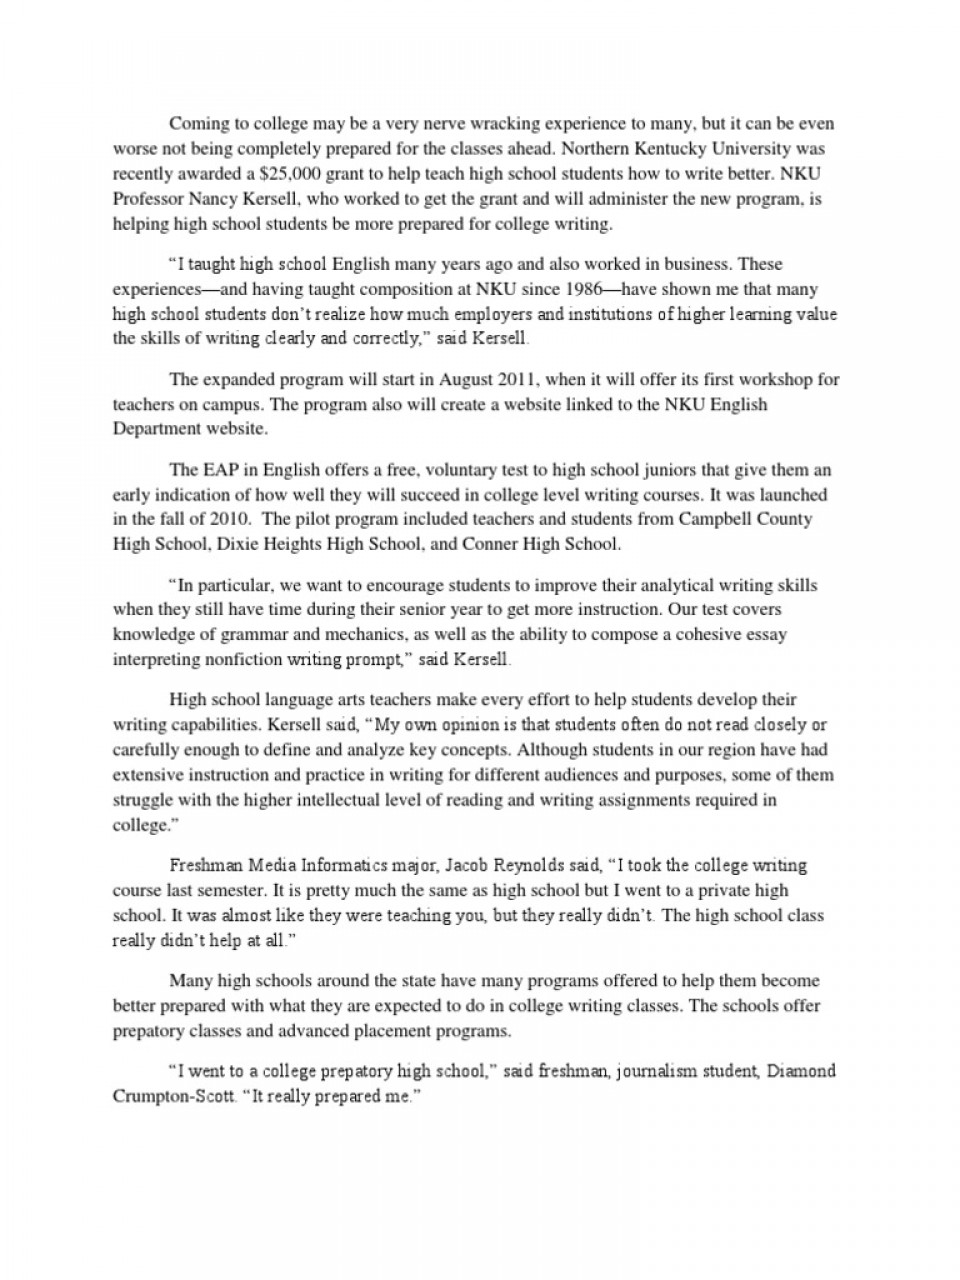 001 Essay On My High School Experience Custom Paper Help Free Dreaded 960